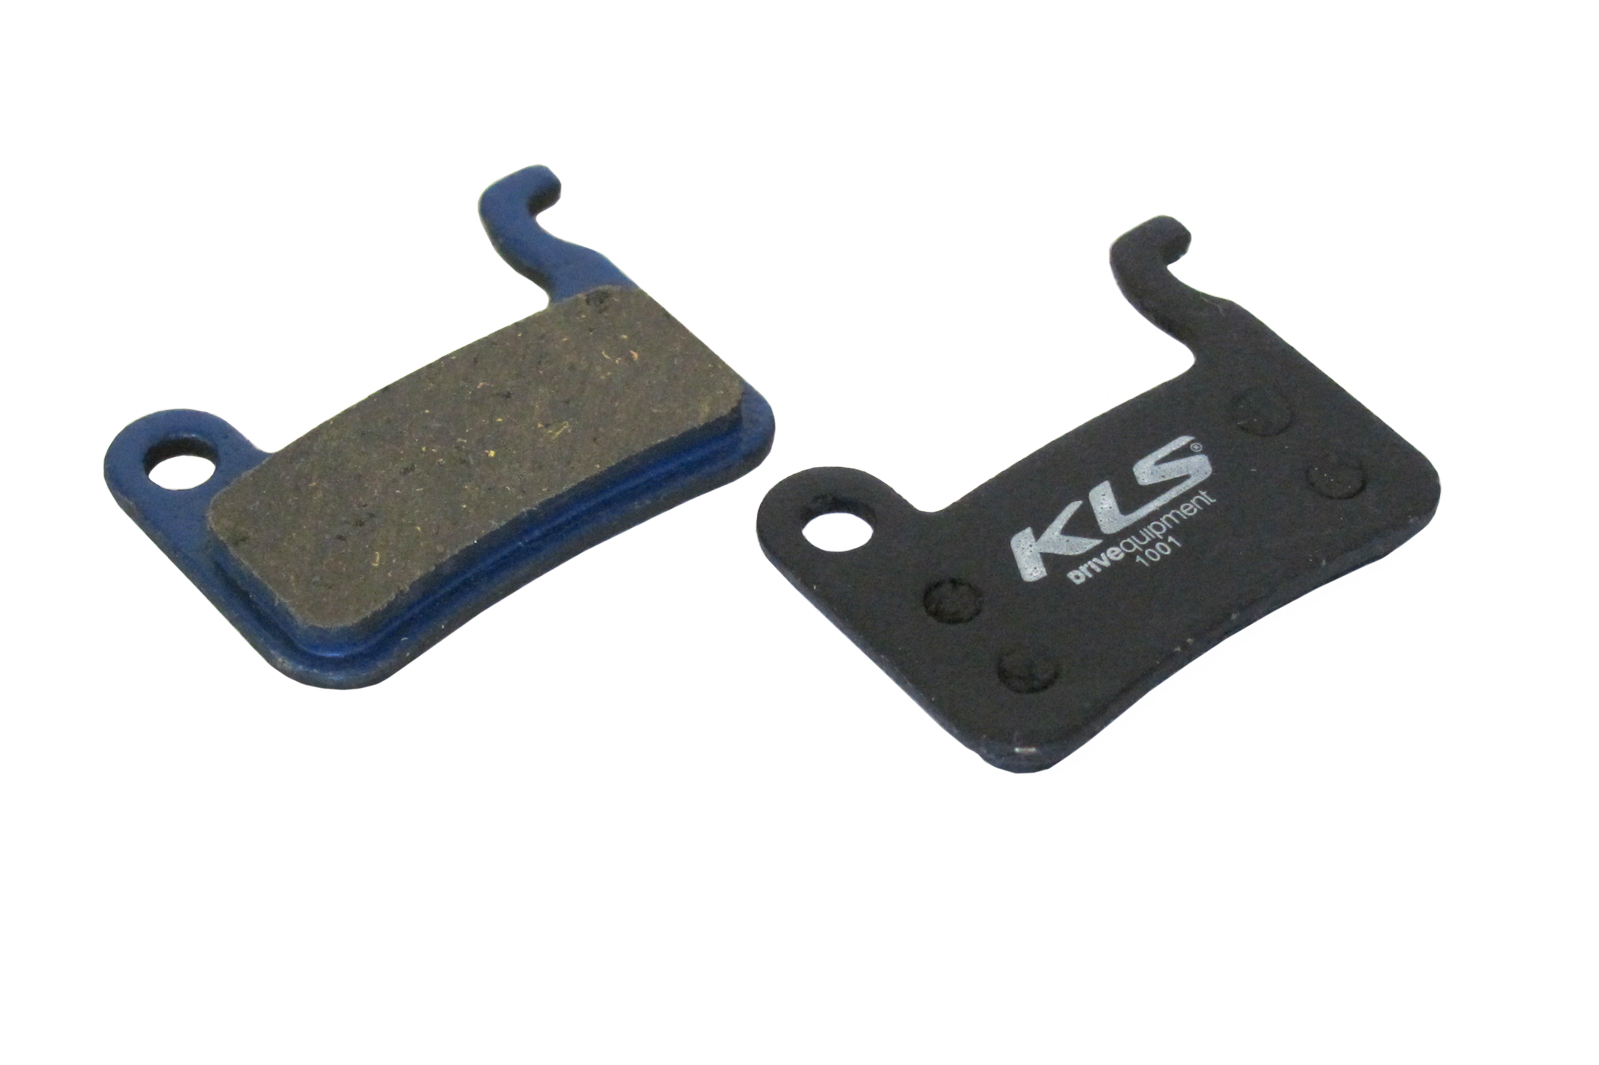 Brzdové destičky KLS D-03, organické